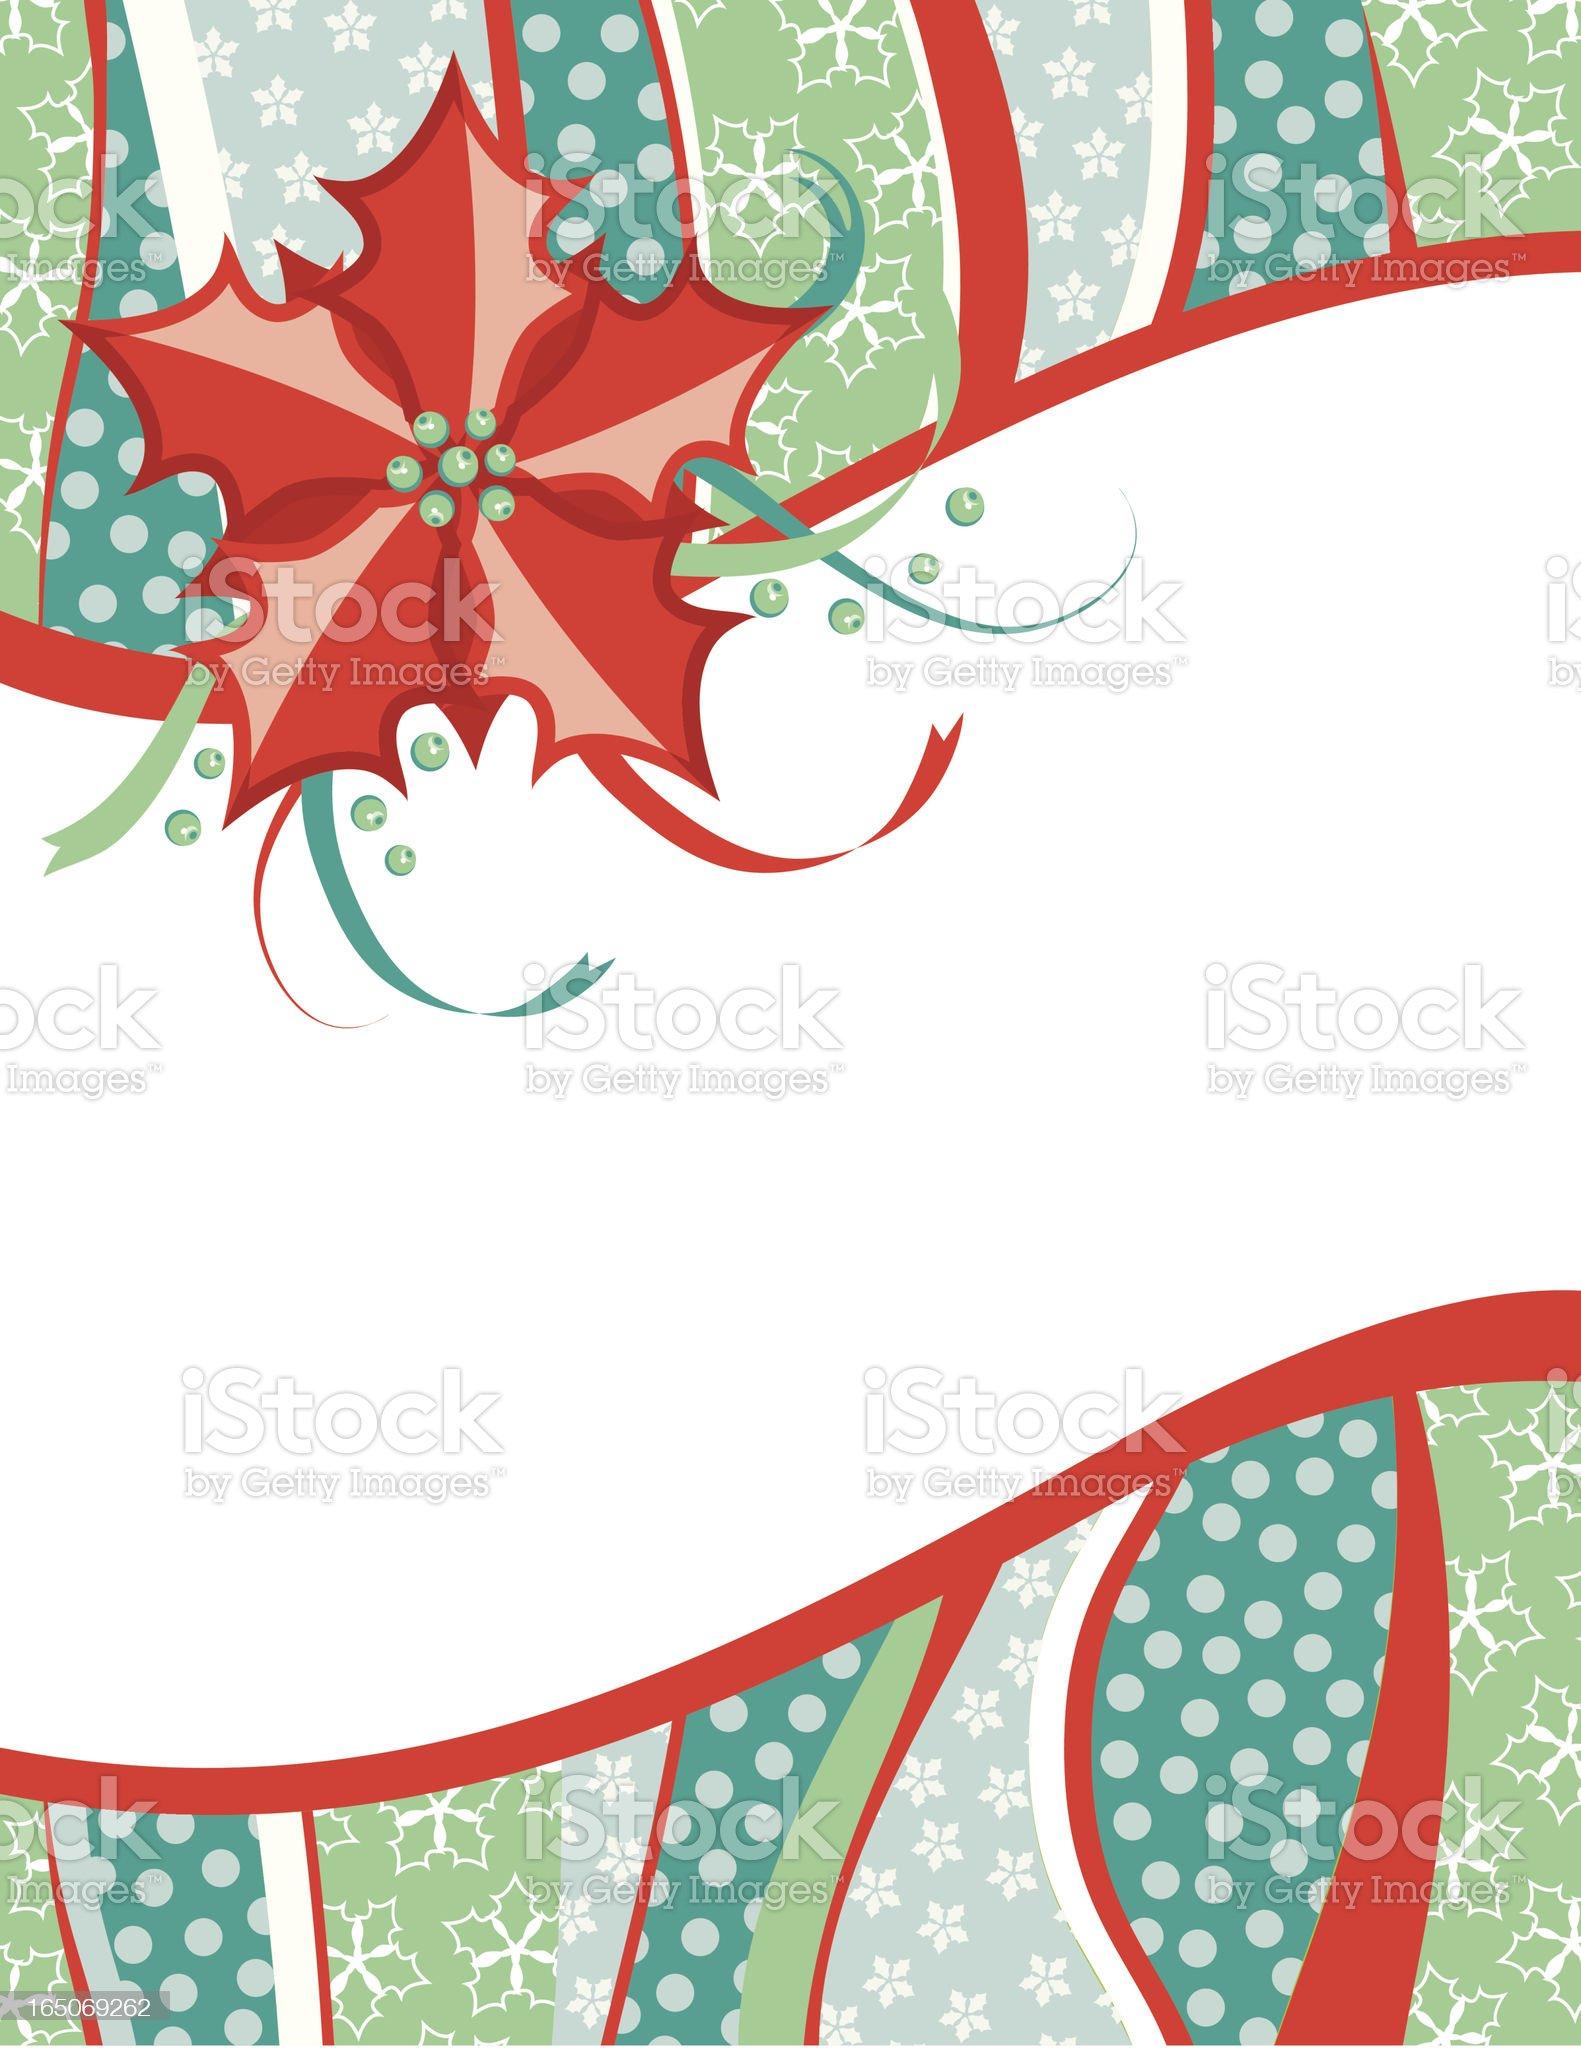 Retro Poinsettia Christmas Card royalty-free stock vector art